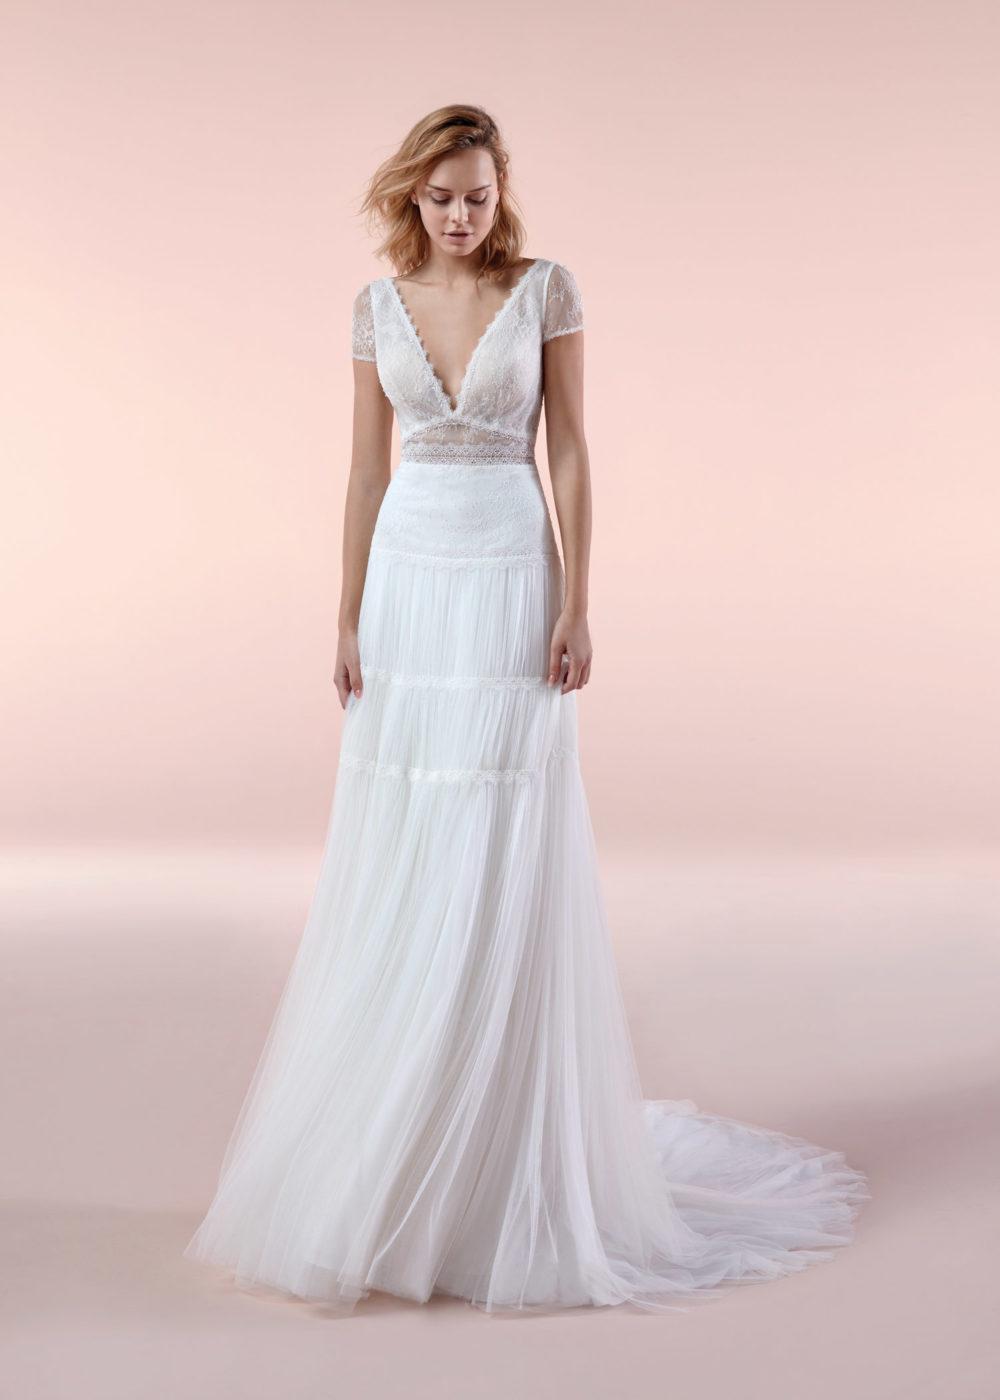 Mariages: abito da sposa Boho Chic Nicole 2020 a Vicenza, Verona, Padova, Veneto BCA20121